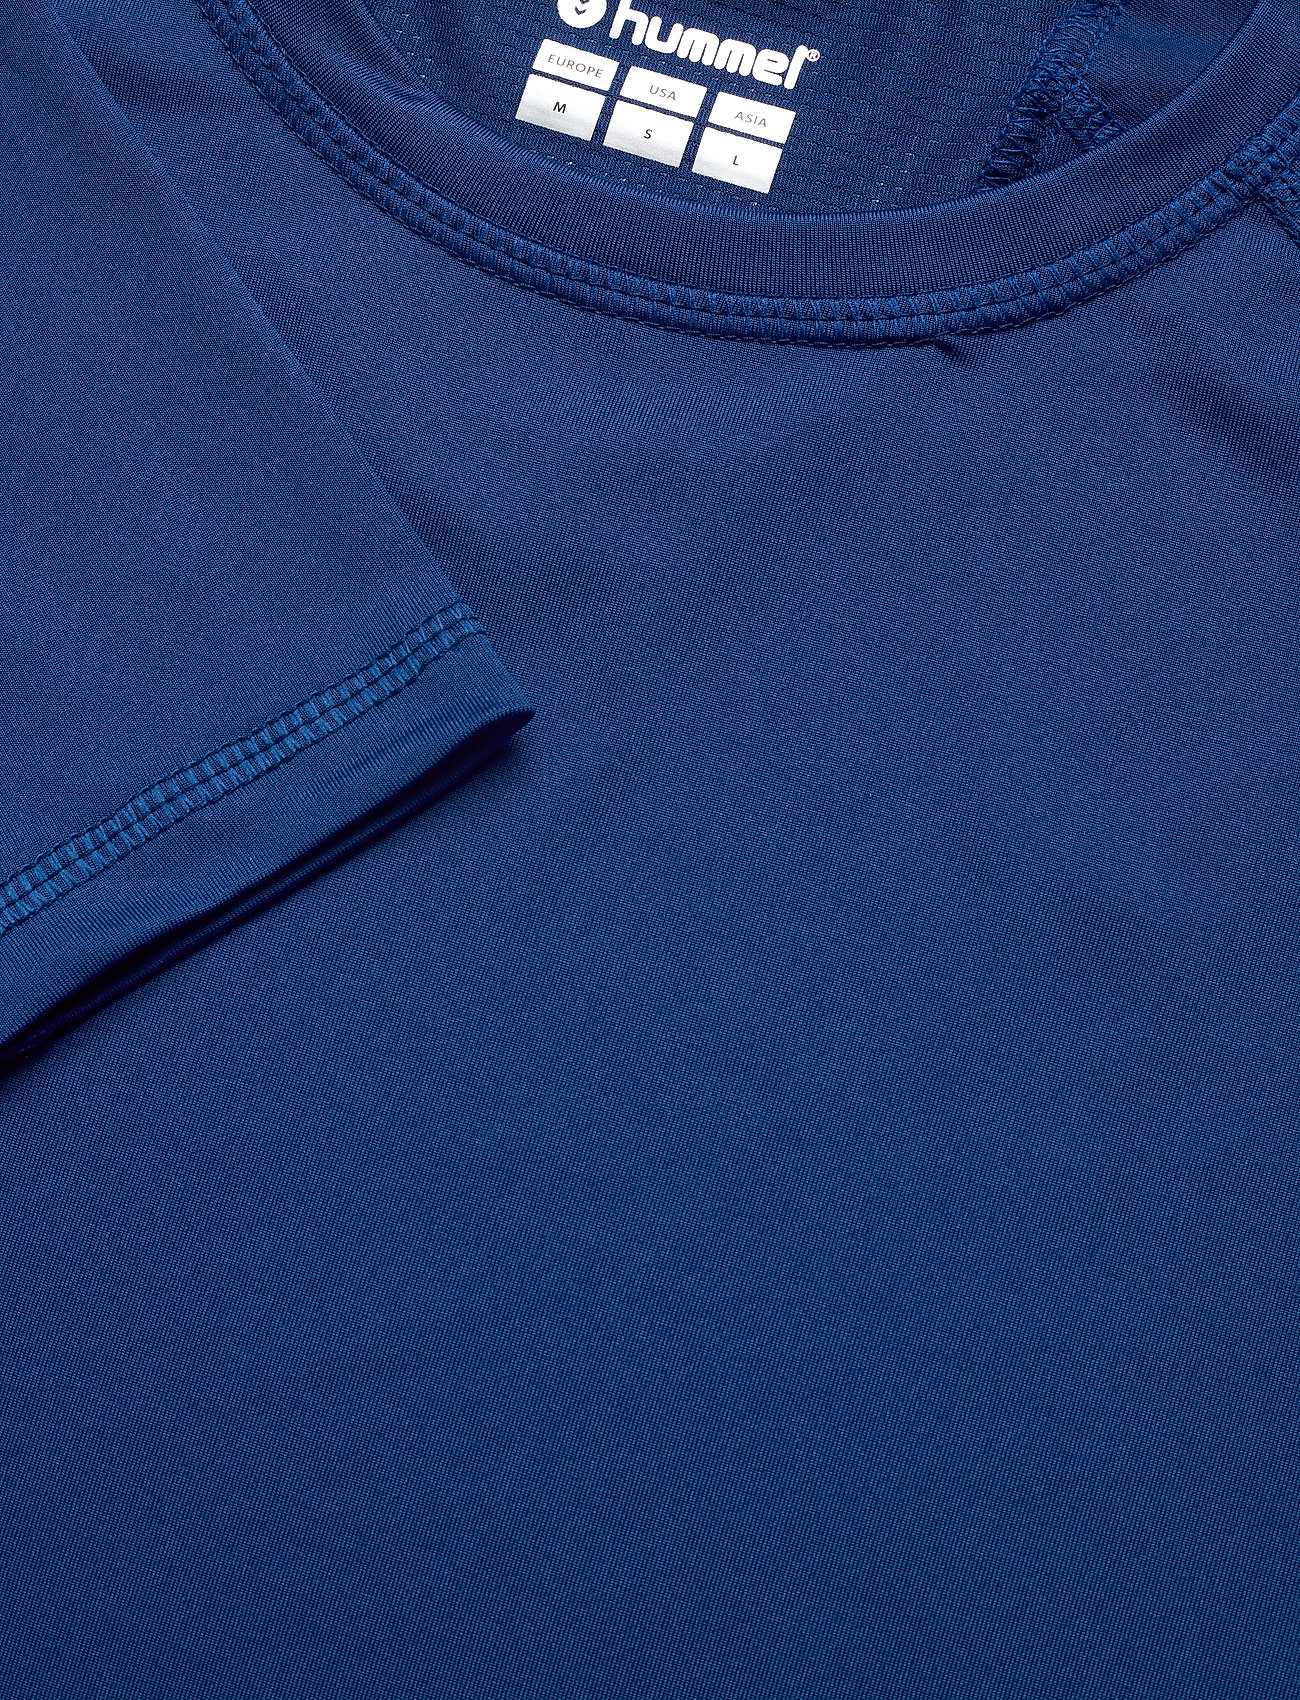 Hummel HML FIRST PERFORMANCE JERSEY L/S - T-skjorter TRUE BLUE - Menn Klær